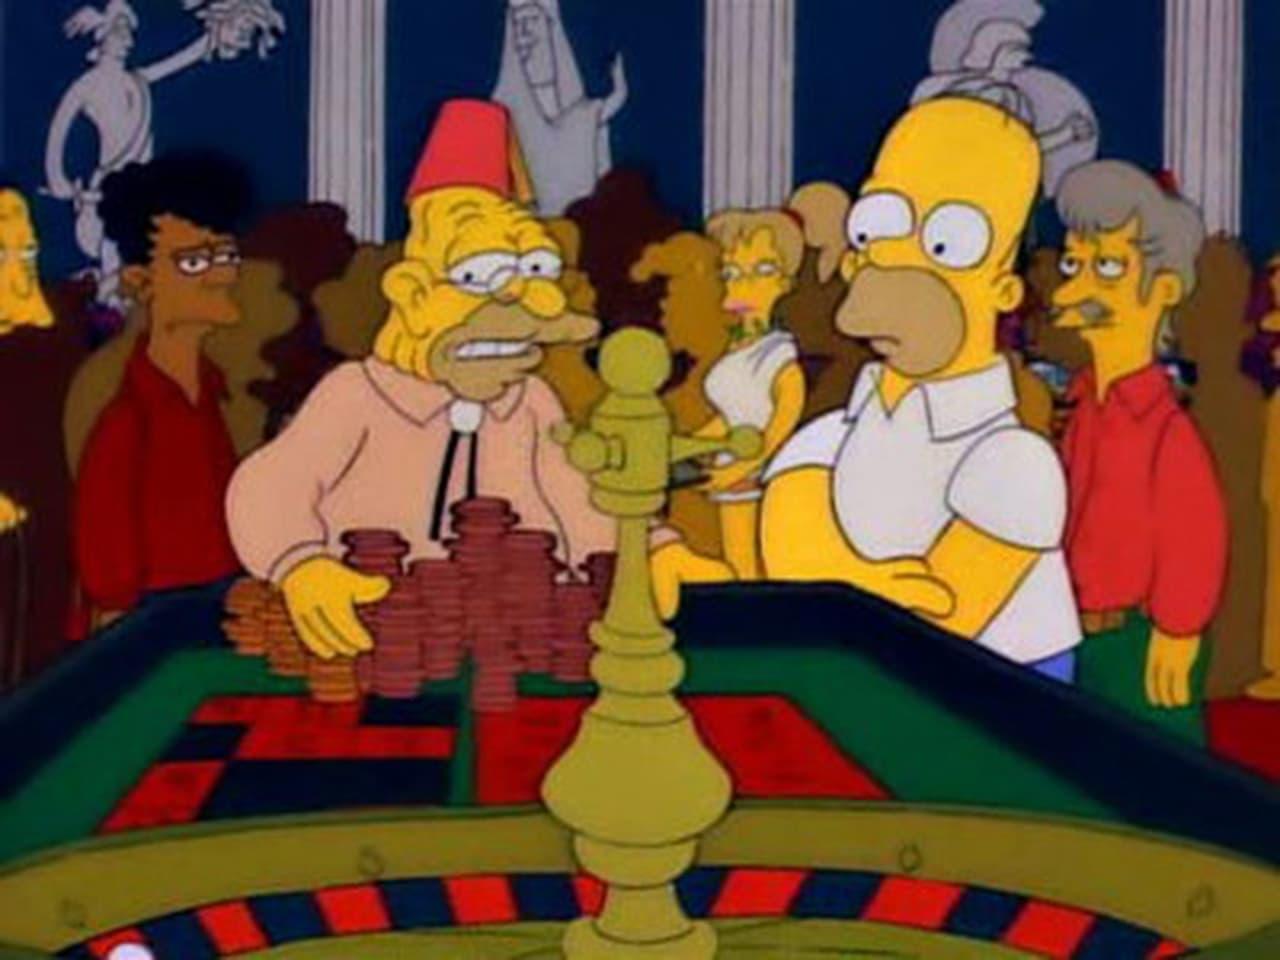 The Simpsons - Season 2 Episode 17 : Old Money